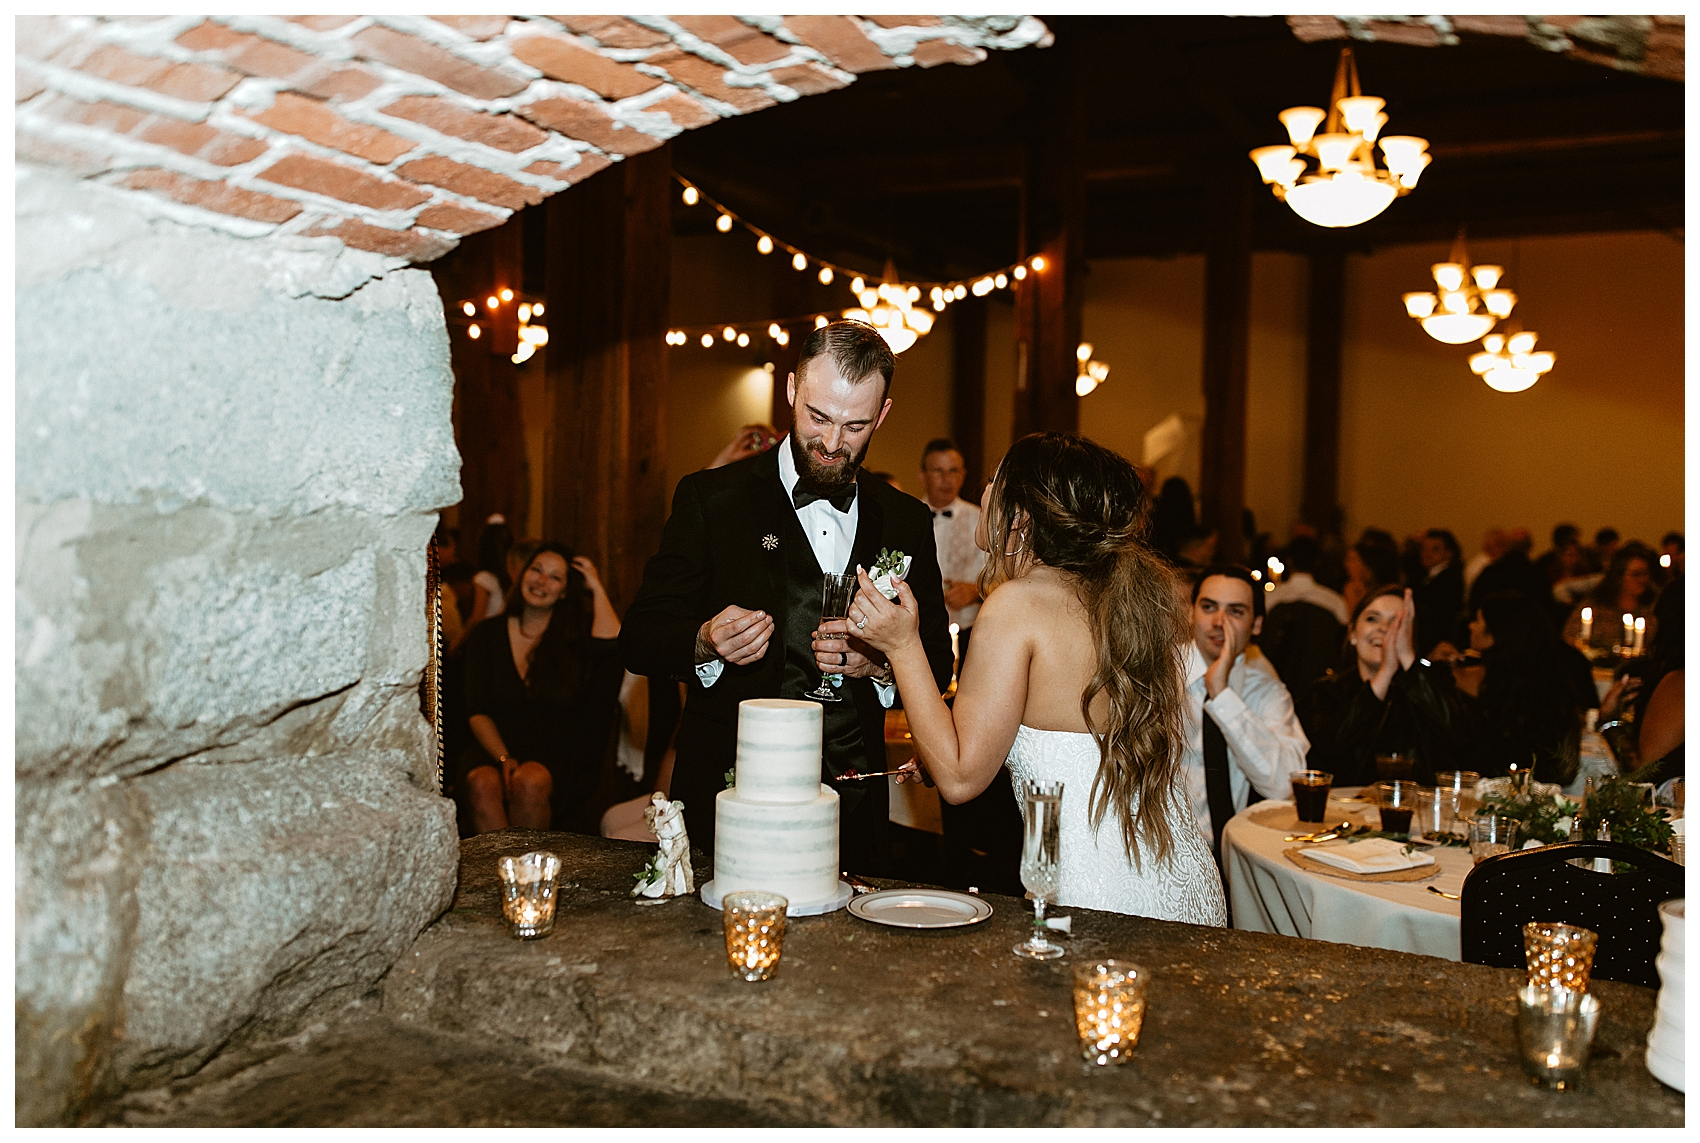 Chateau Rive Spokane Wedding Cassie Trottier Photography01107.jpg